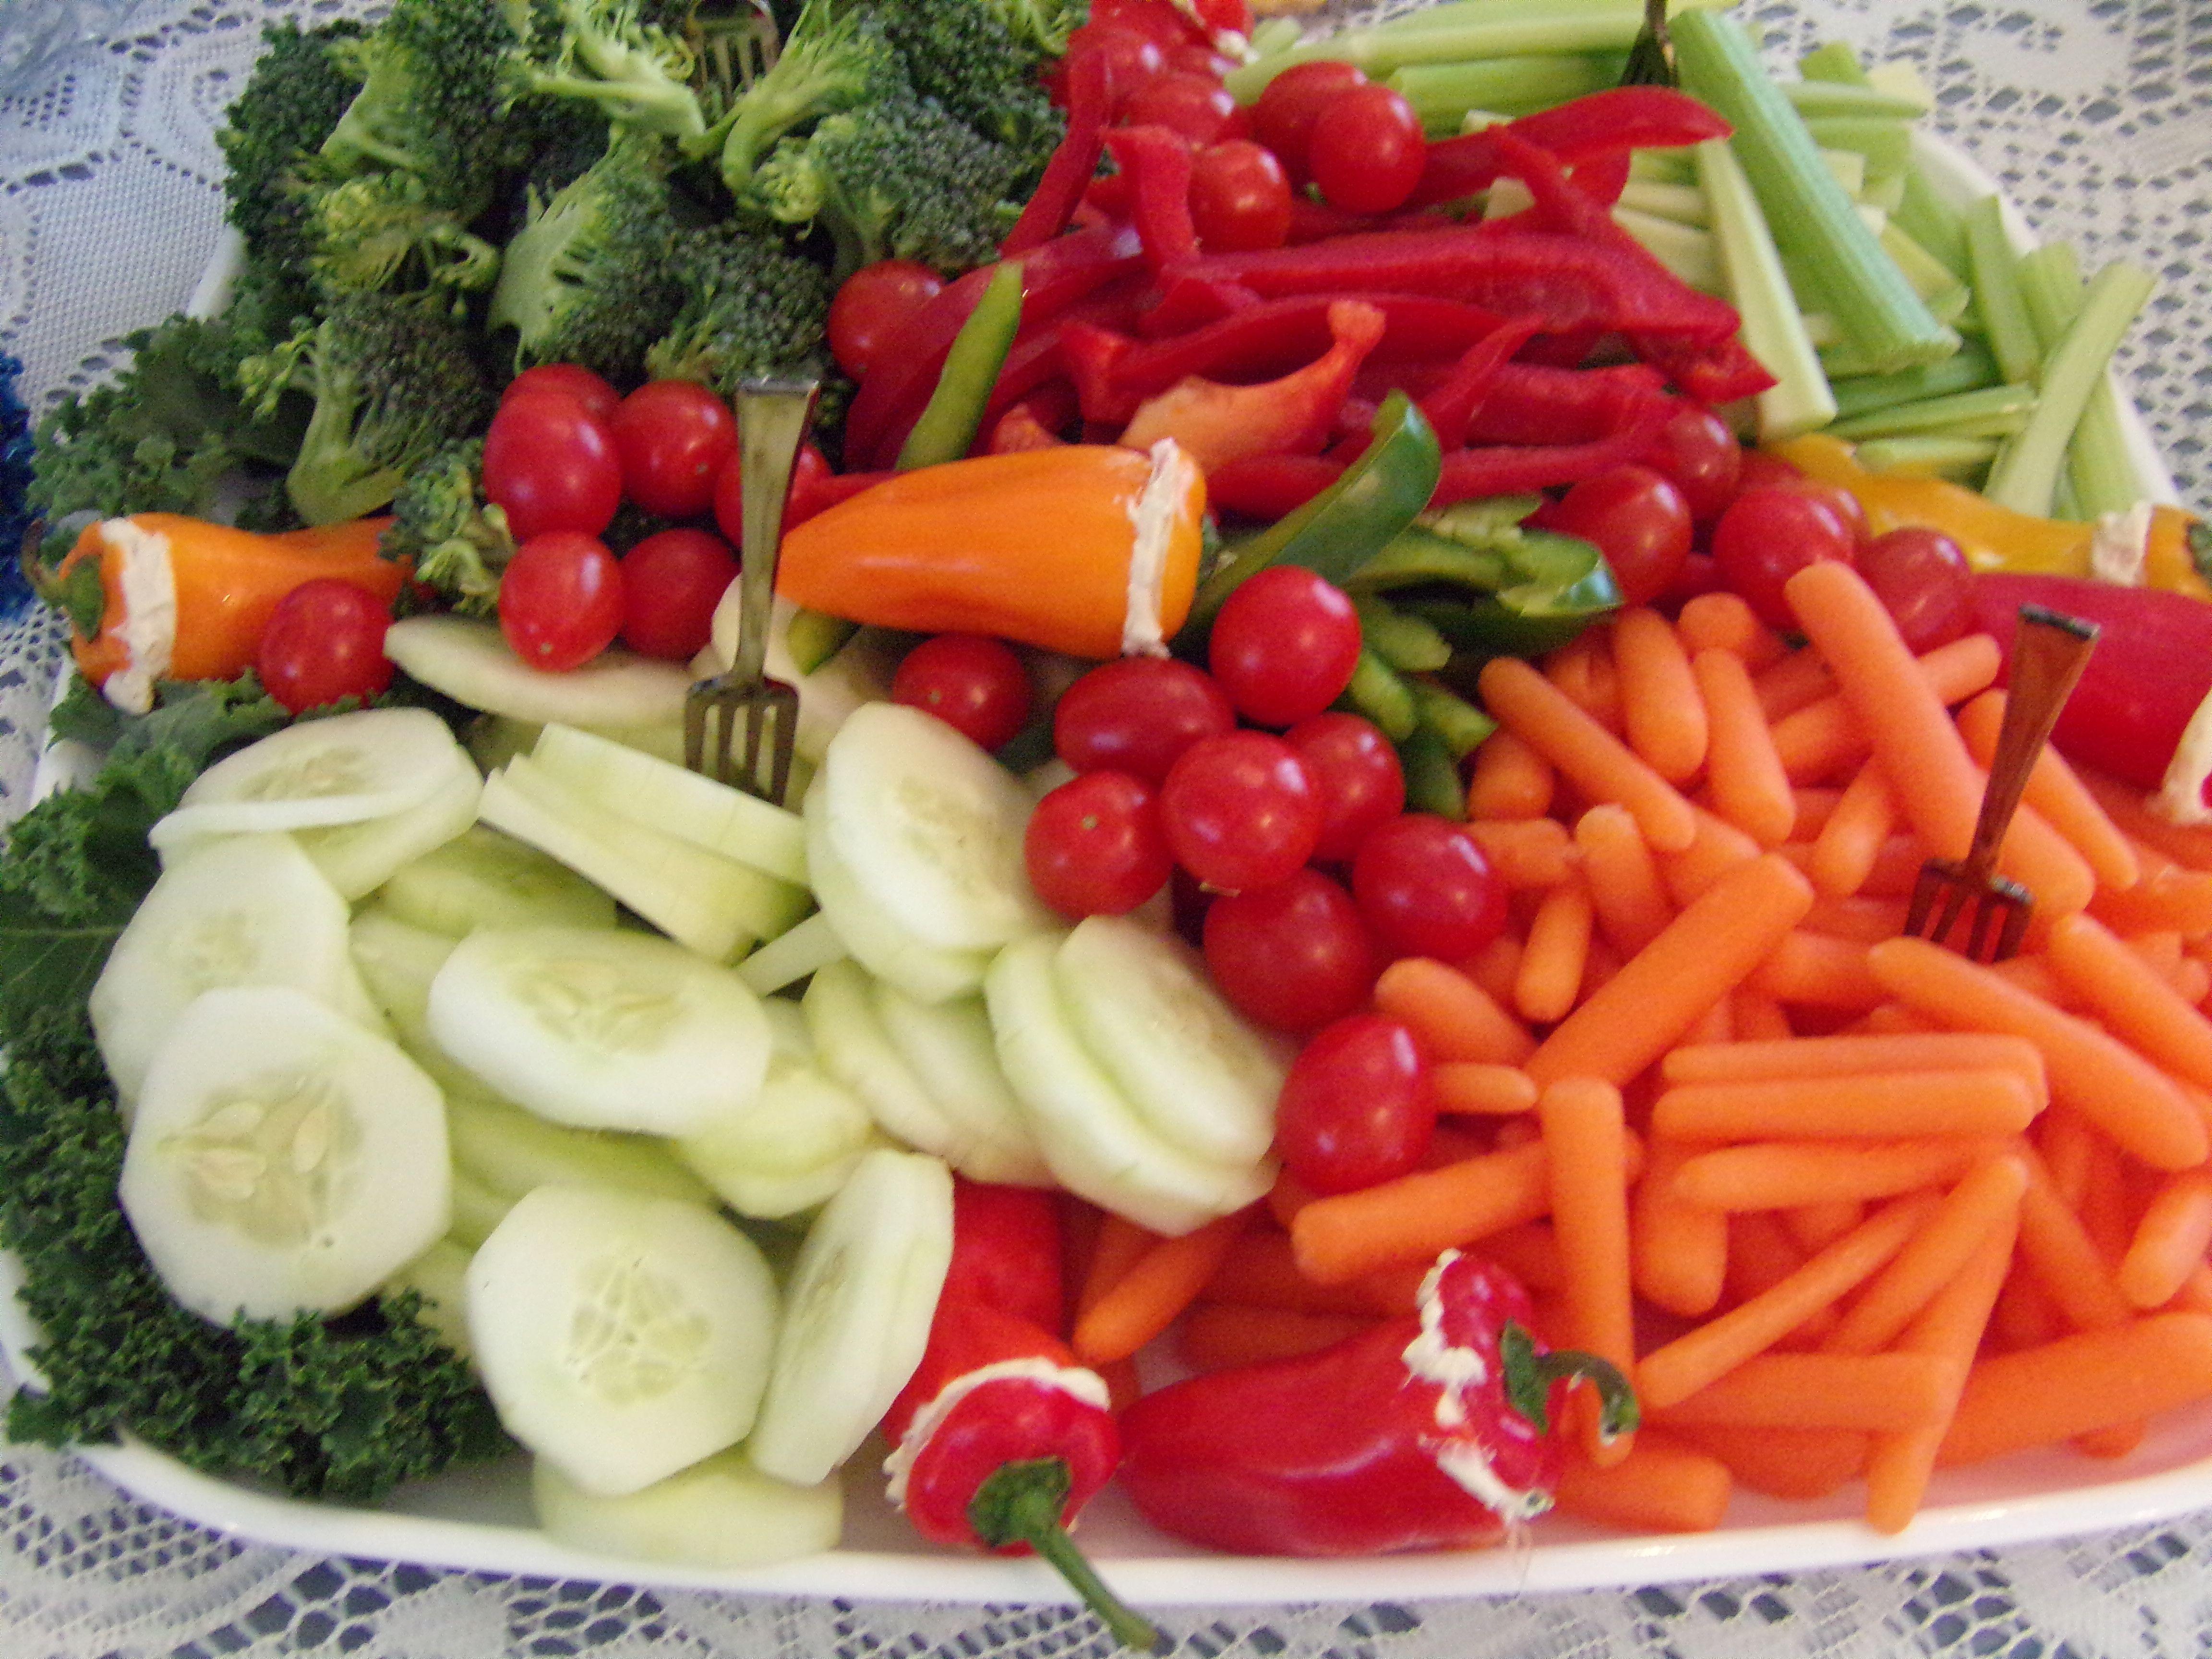 Vegetable platter southern belle gentleman heather s baby shower i